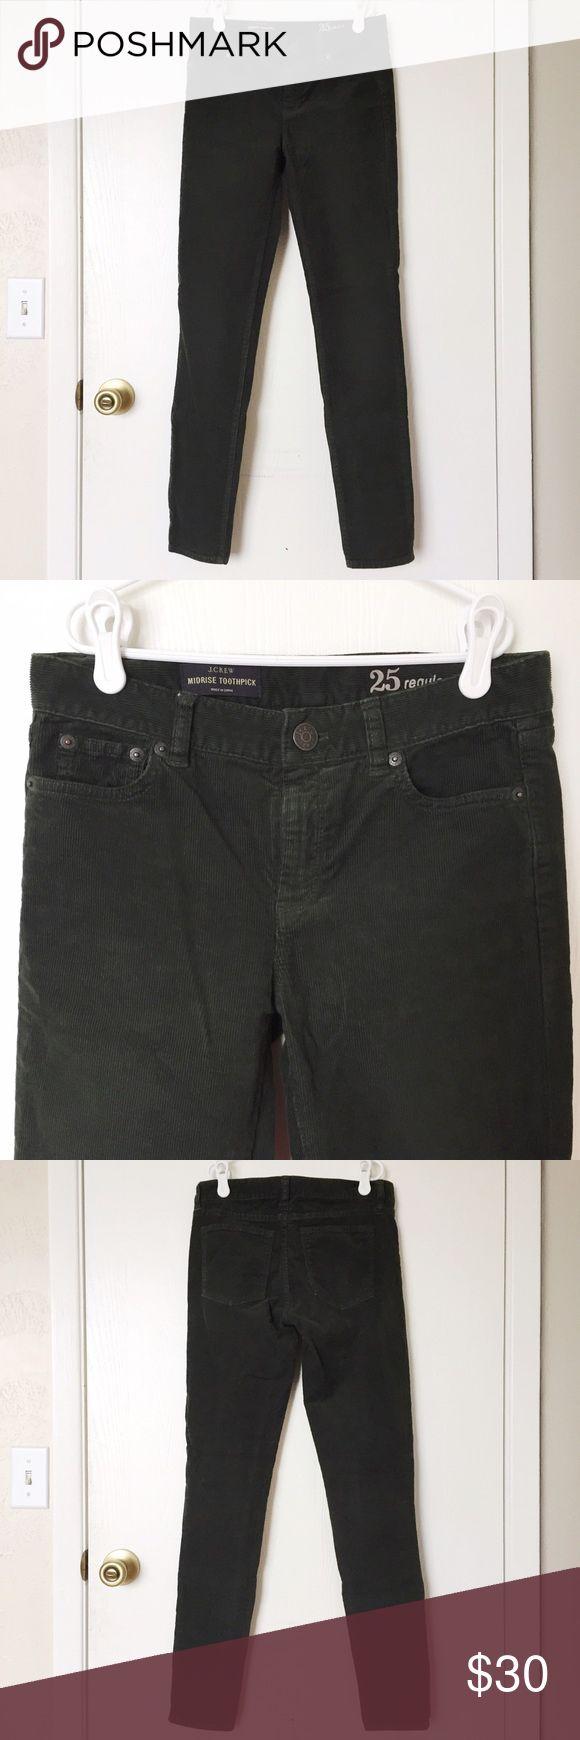 Selling this J.Crew forest green midrise toothpick corduroy jeans size 25 on Poshmark! My username is: hurricanekimi. #shopmycloset #poshmark #fashion #shopping #style #forsale #JCrew #Pants